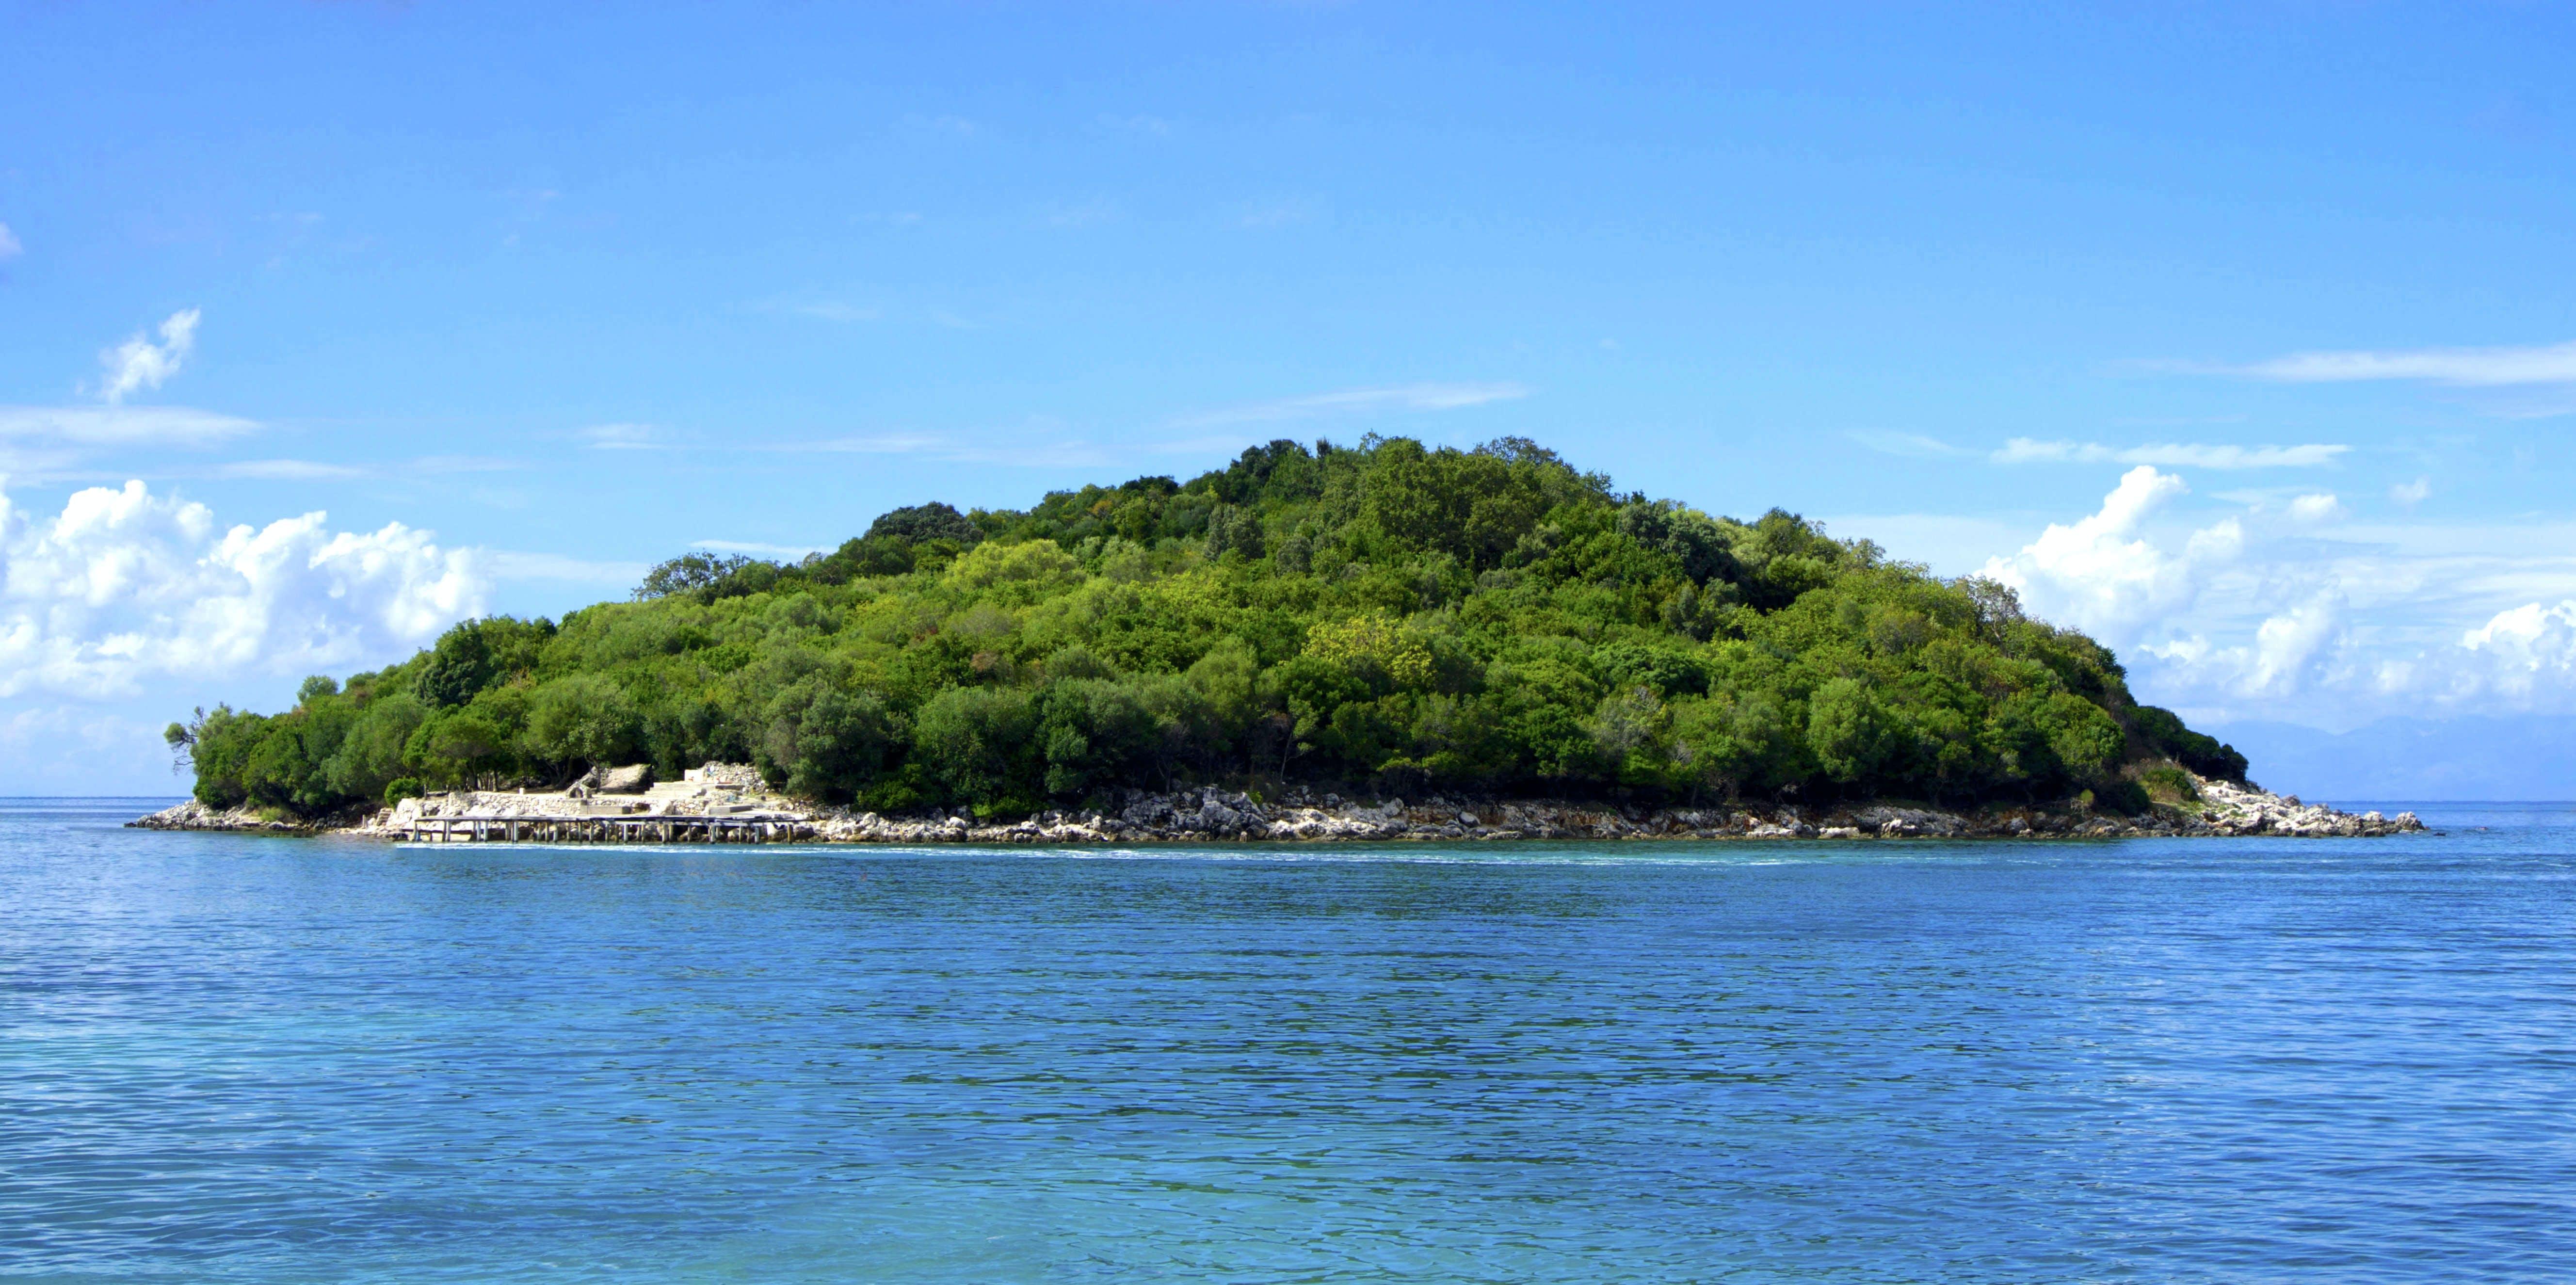 Free stock photo of sea, landscape, beach, vacation